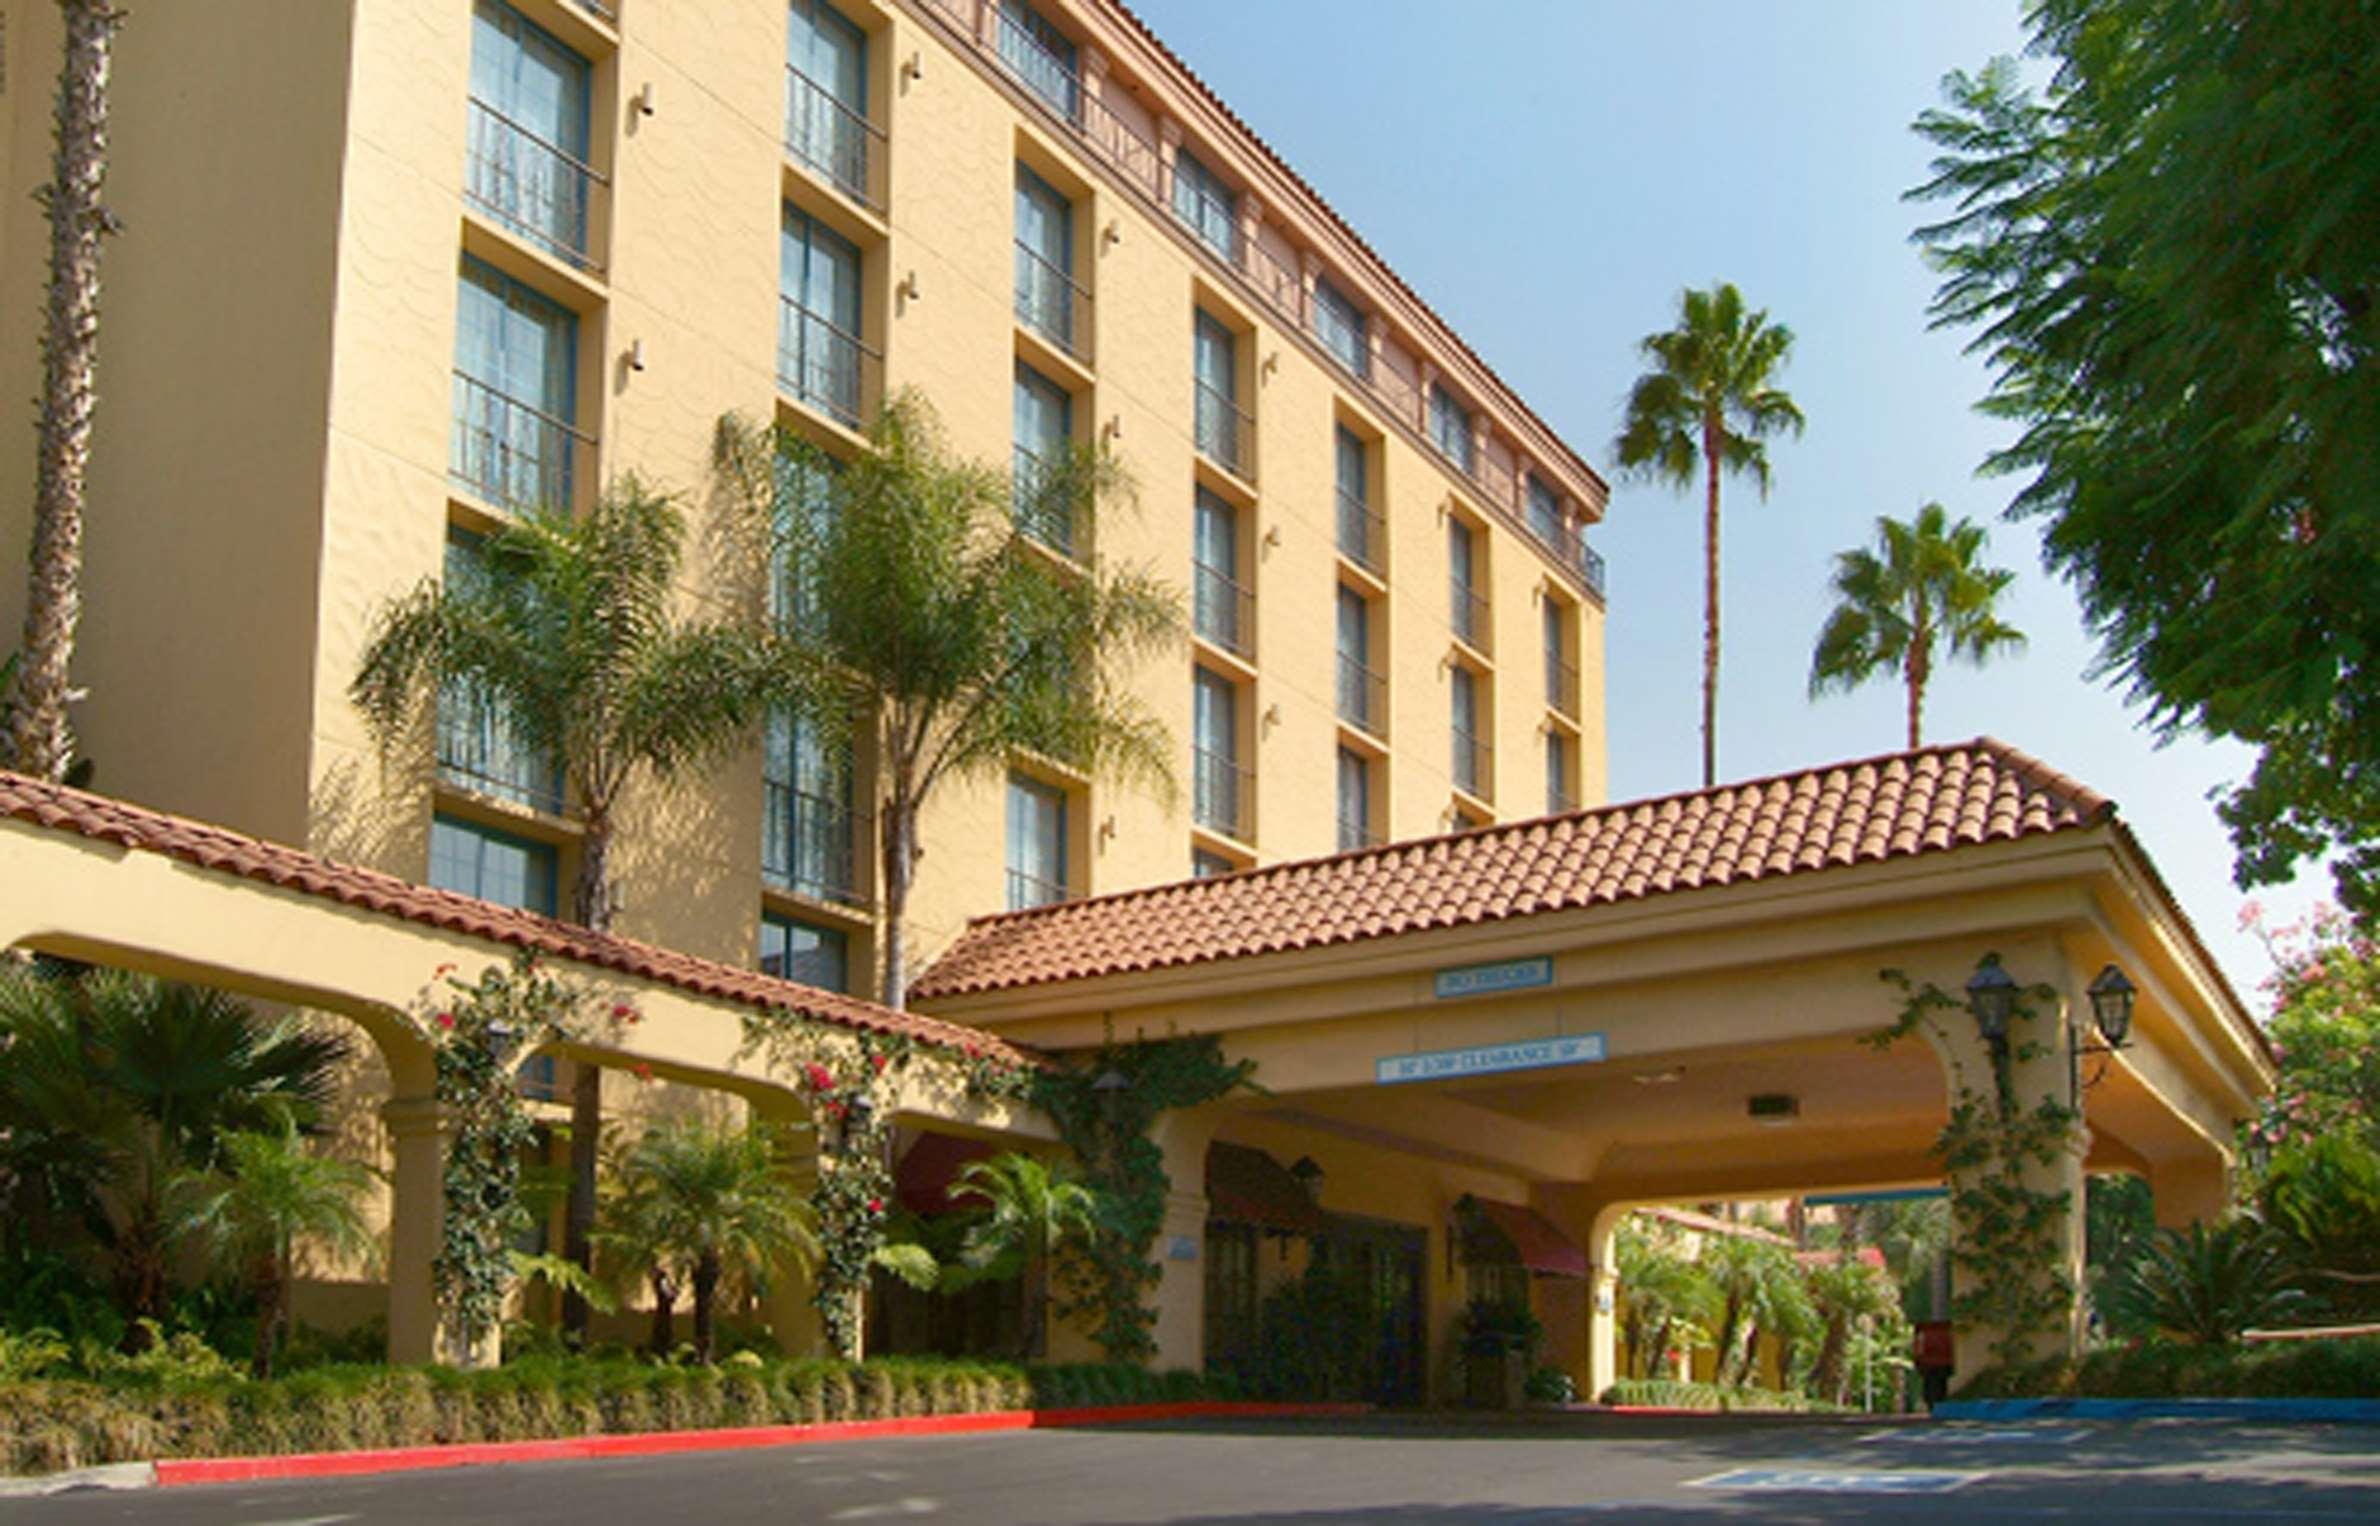 Embassy Suites by Hilton Arcadia Pasadena Area image 1